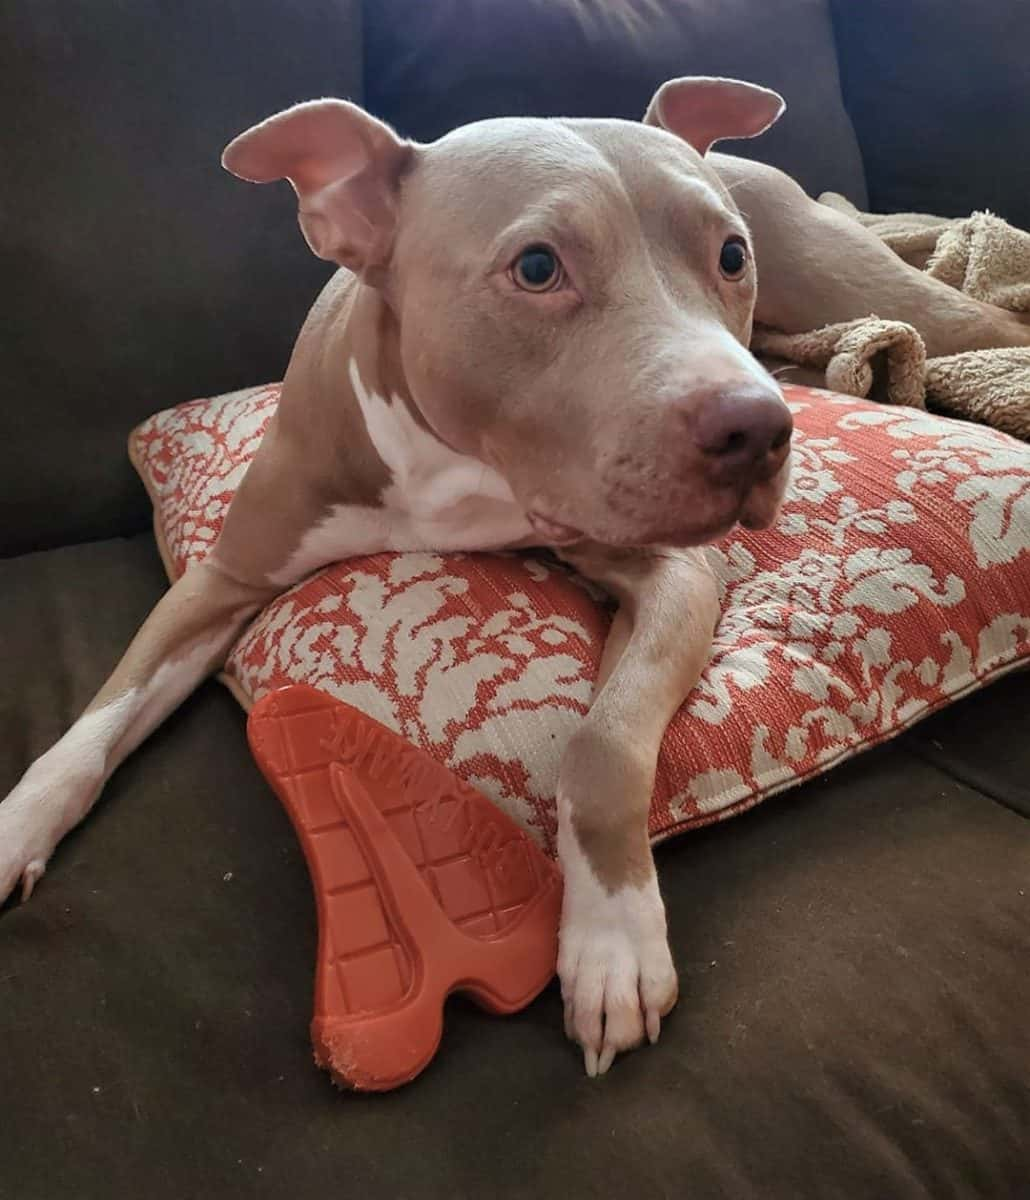 Blue fawn Pitbull lying on the sofa